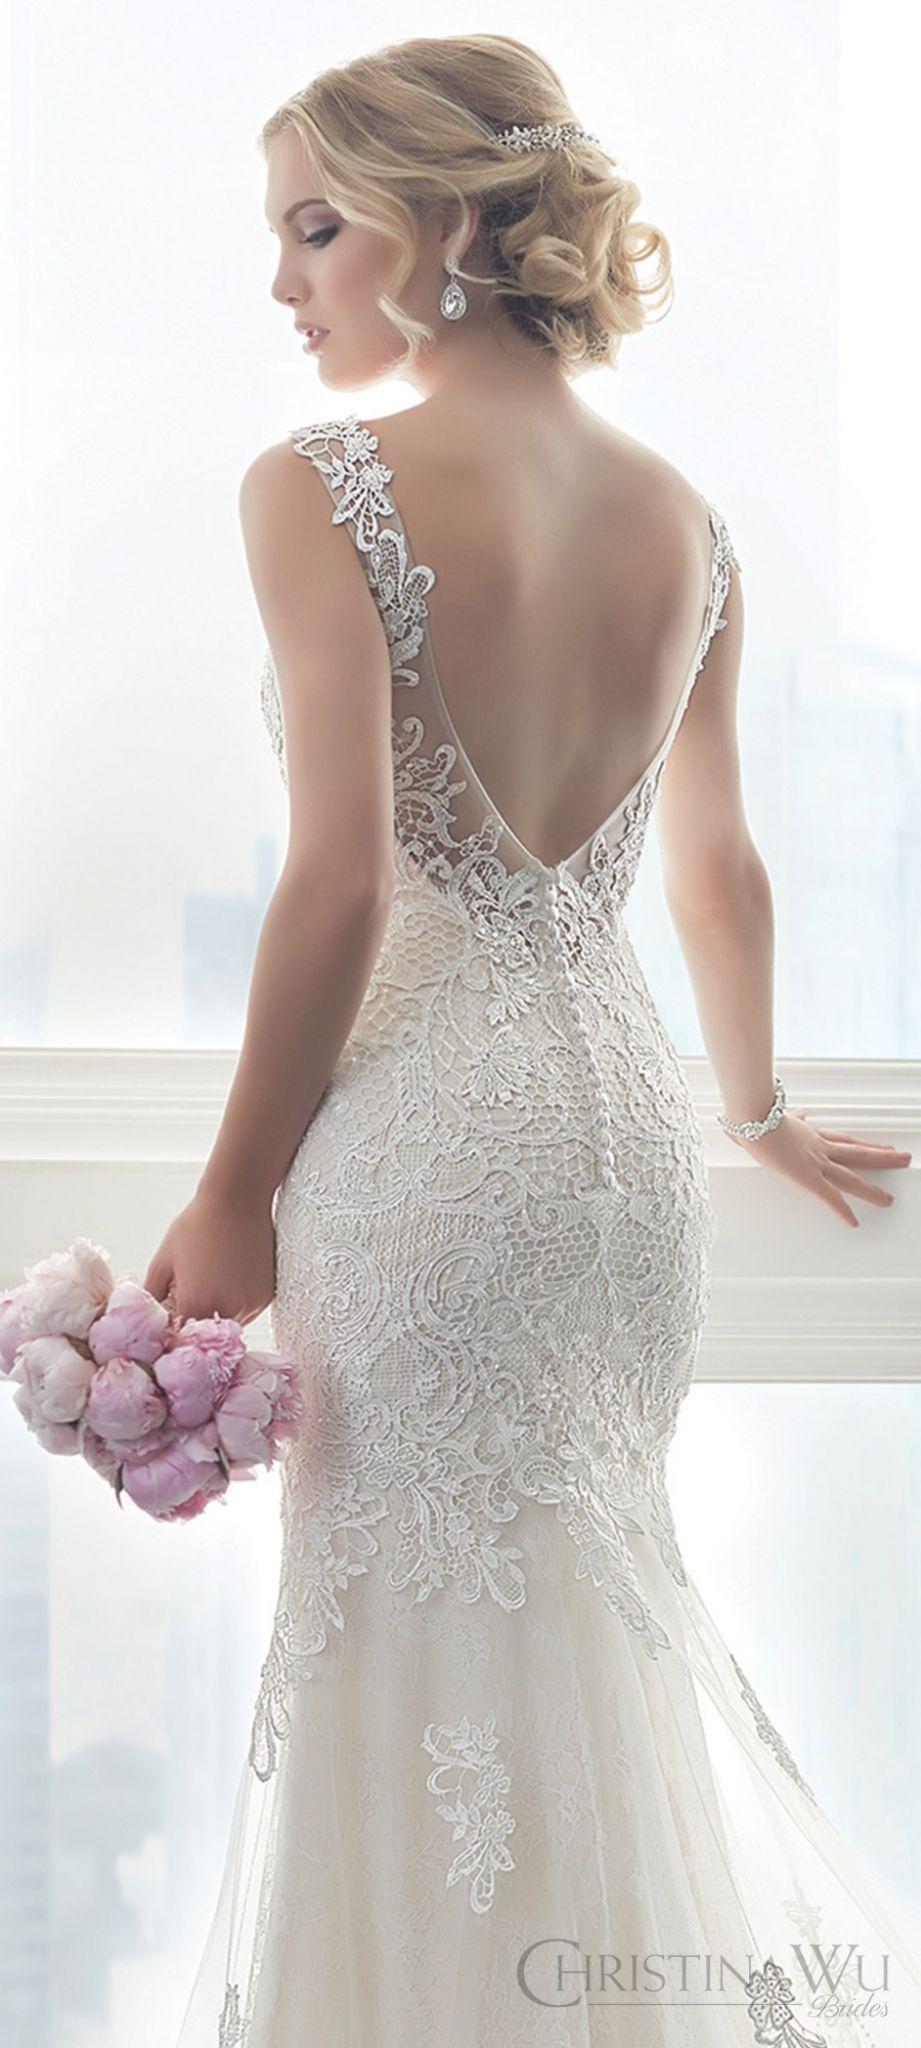 Christina wu wedding dresses  christina wu wedding dresses  wedding dresses for fall Check more